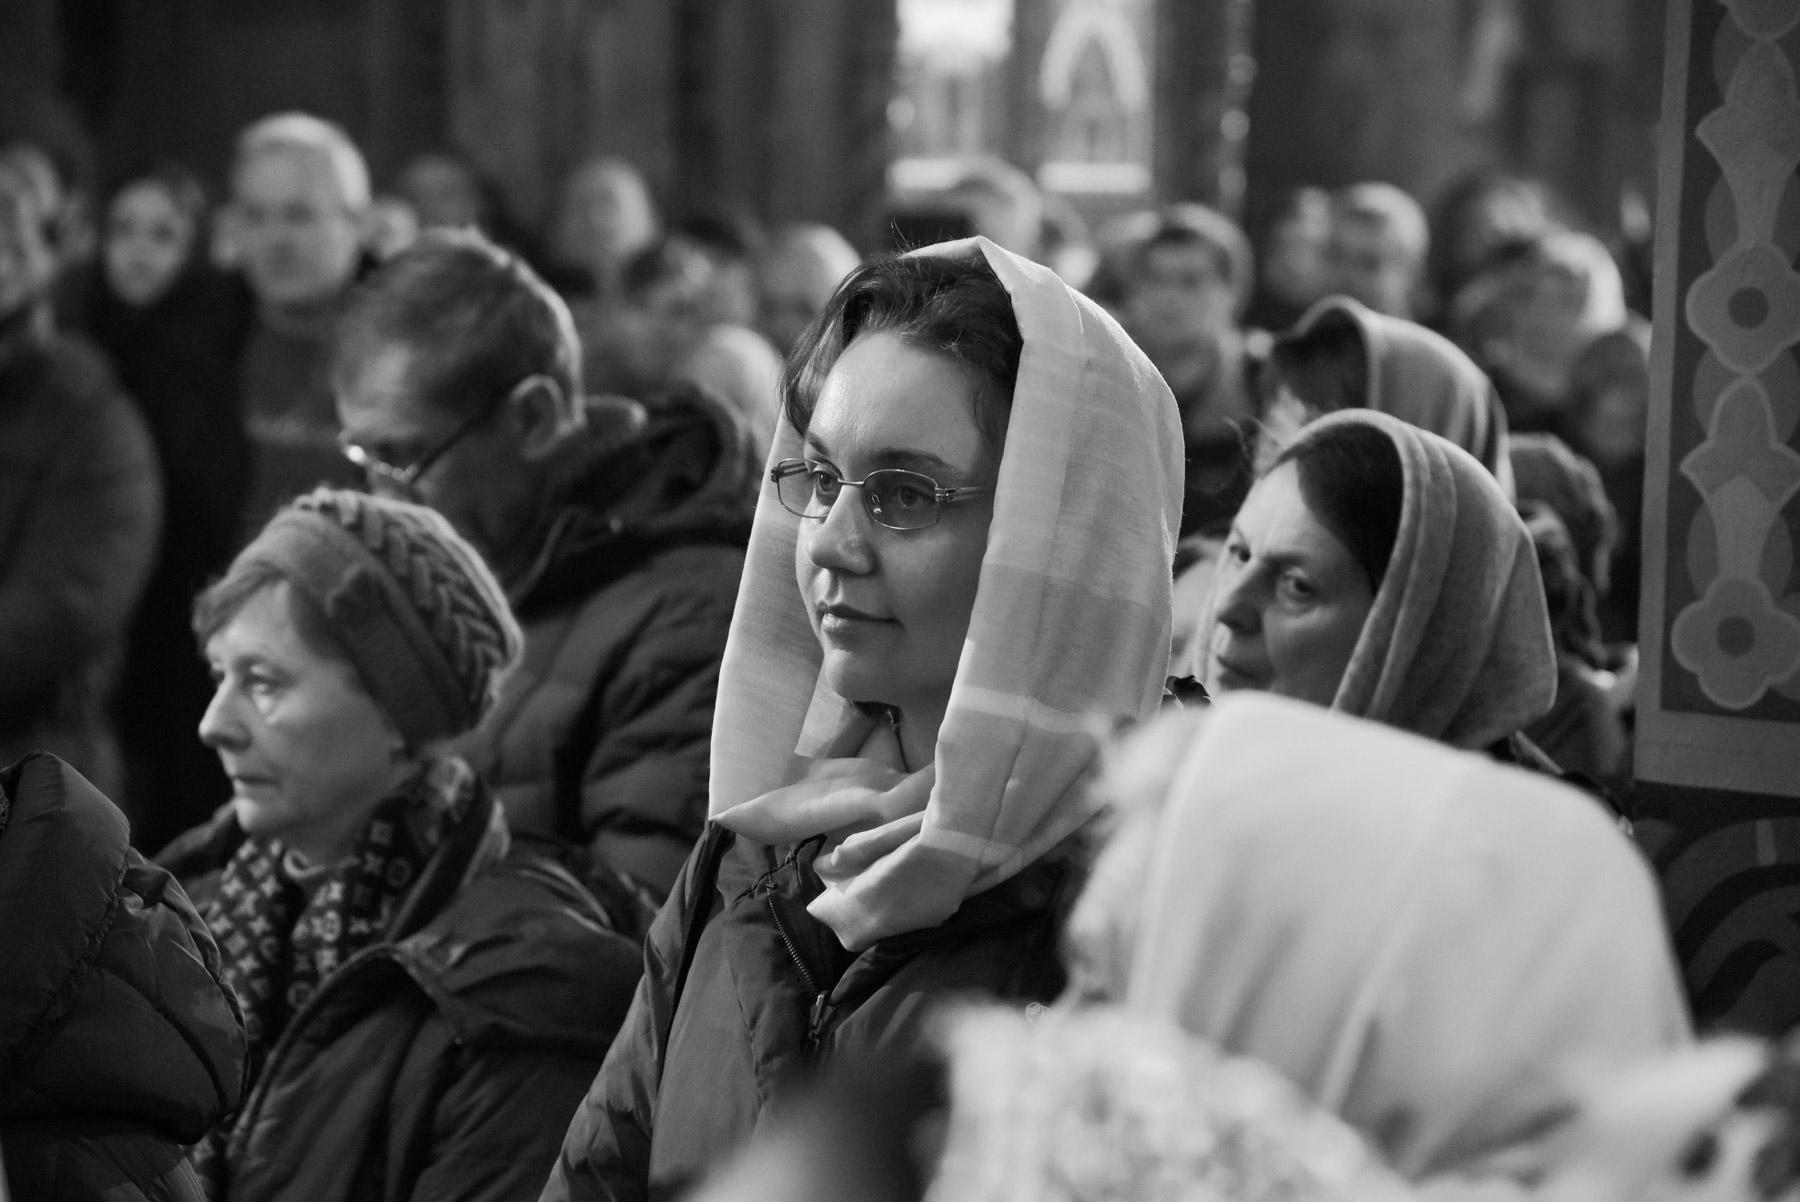 photos of orthodox christmas 0107 2